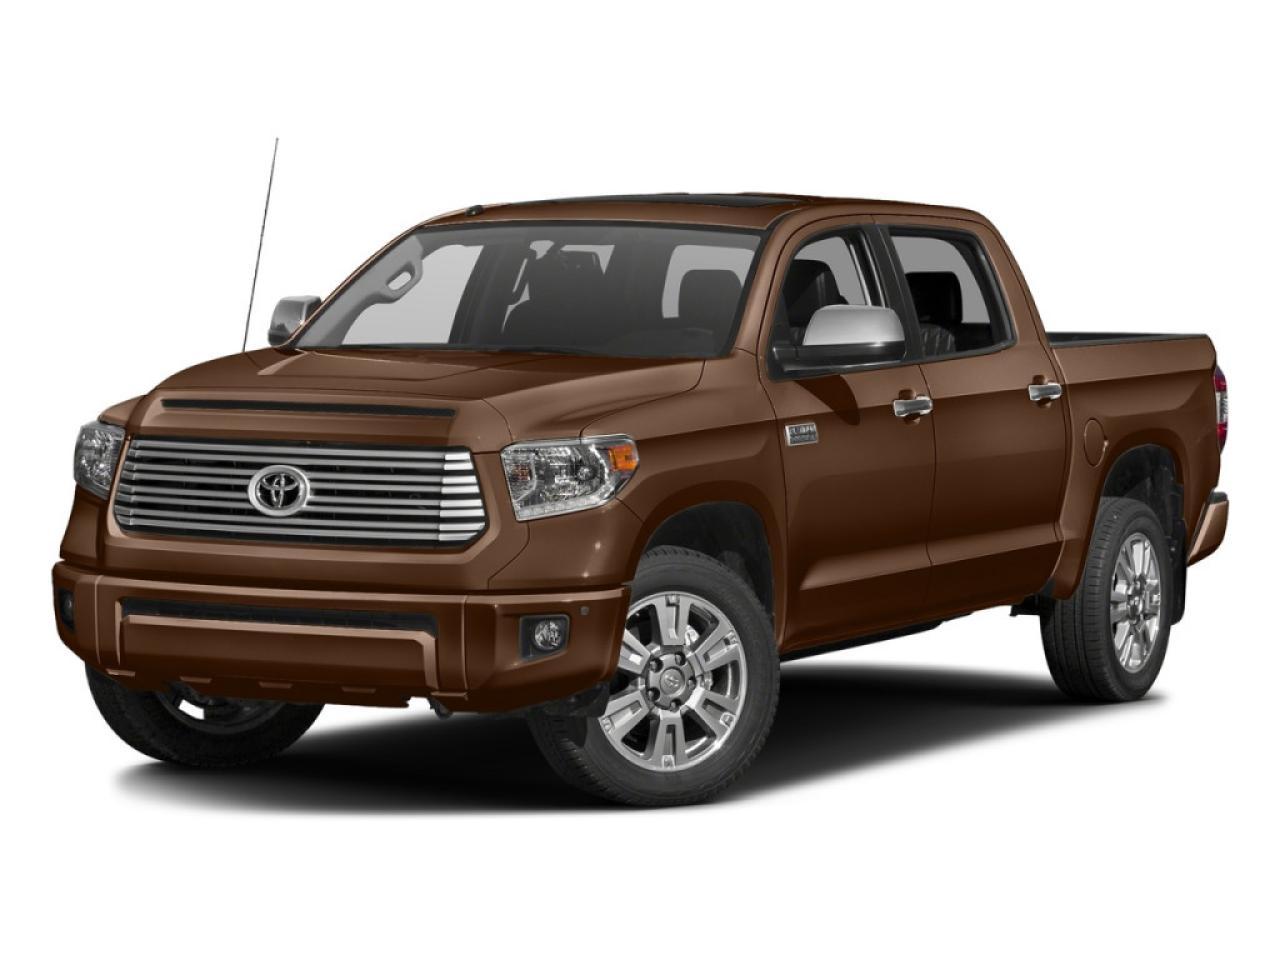 2017 Toyota Tundra 4x4 Crewmax Platinum